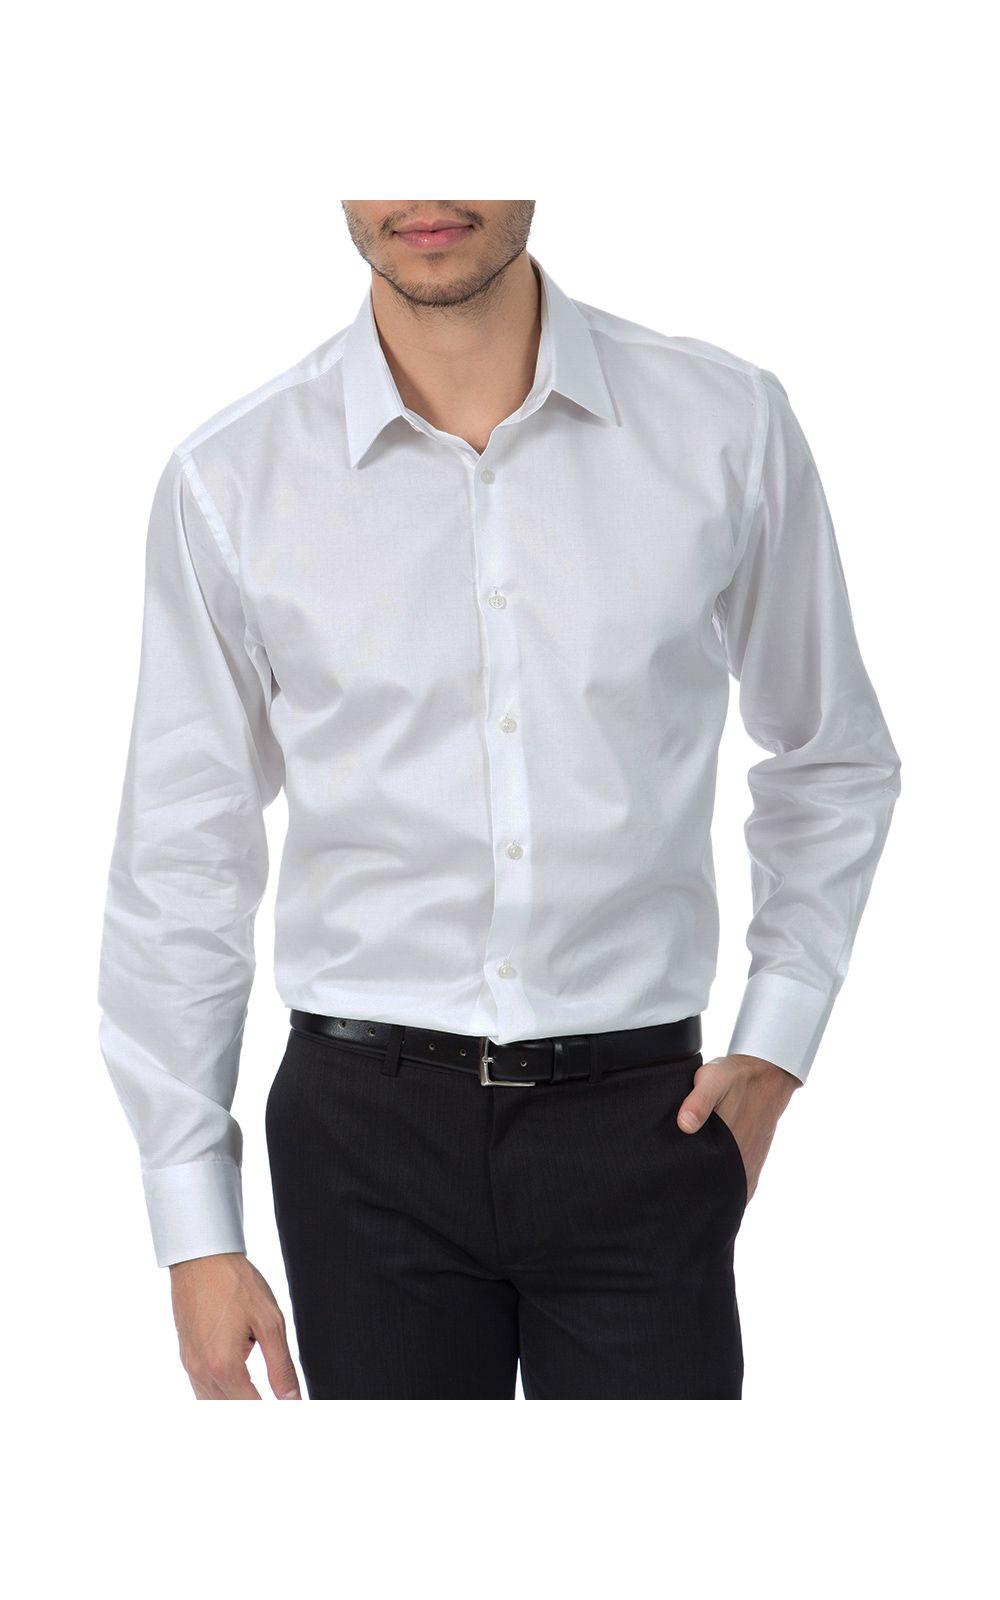 Foto 1 - Camisa Social Masculina Branca Lisa